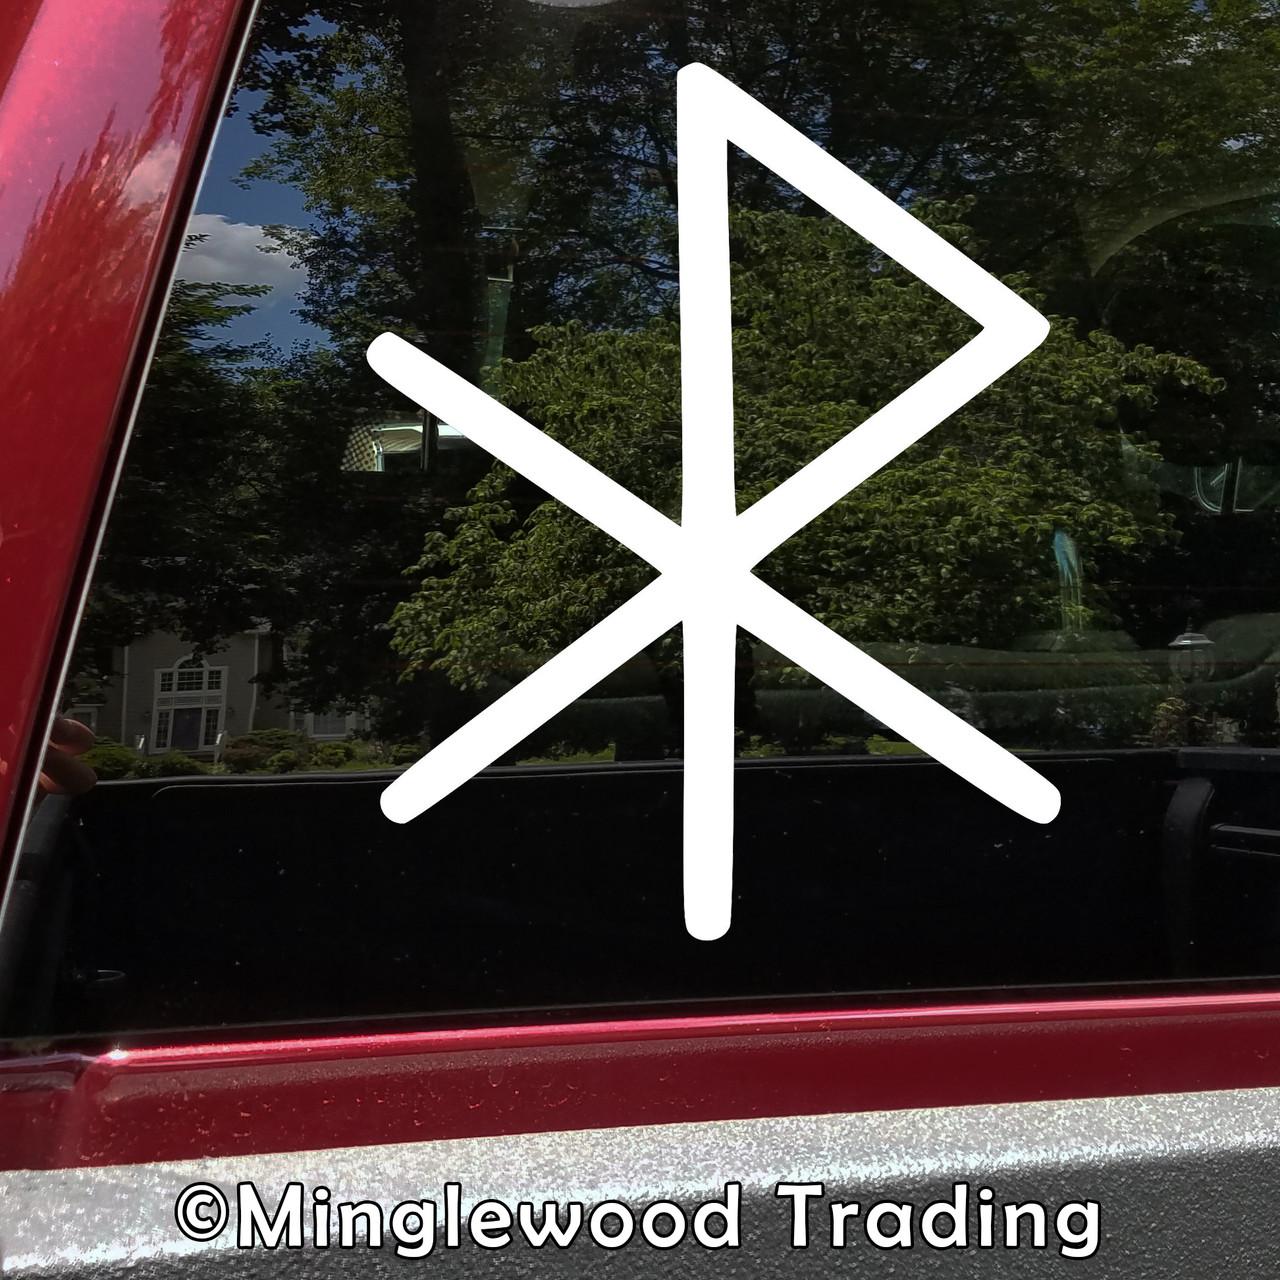 Love Bind Rune Vinyl Sticker - Viking Symbol Glyph Bindrune - Die Cut Decal